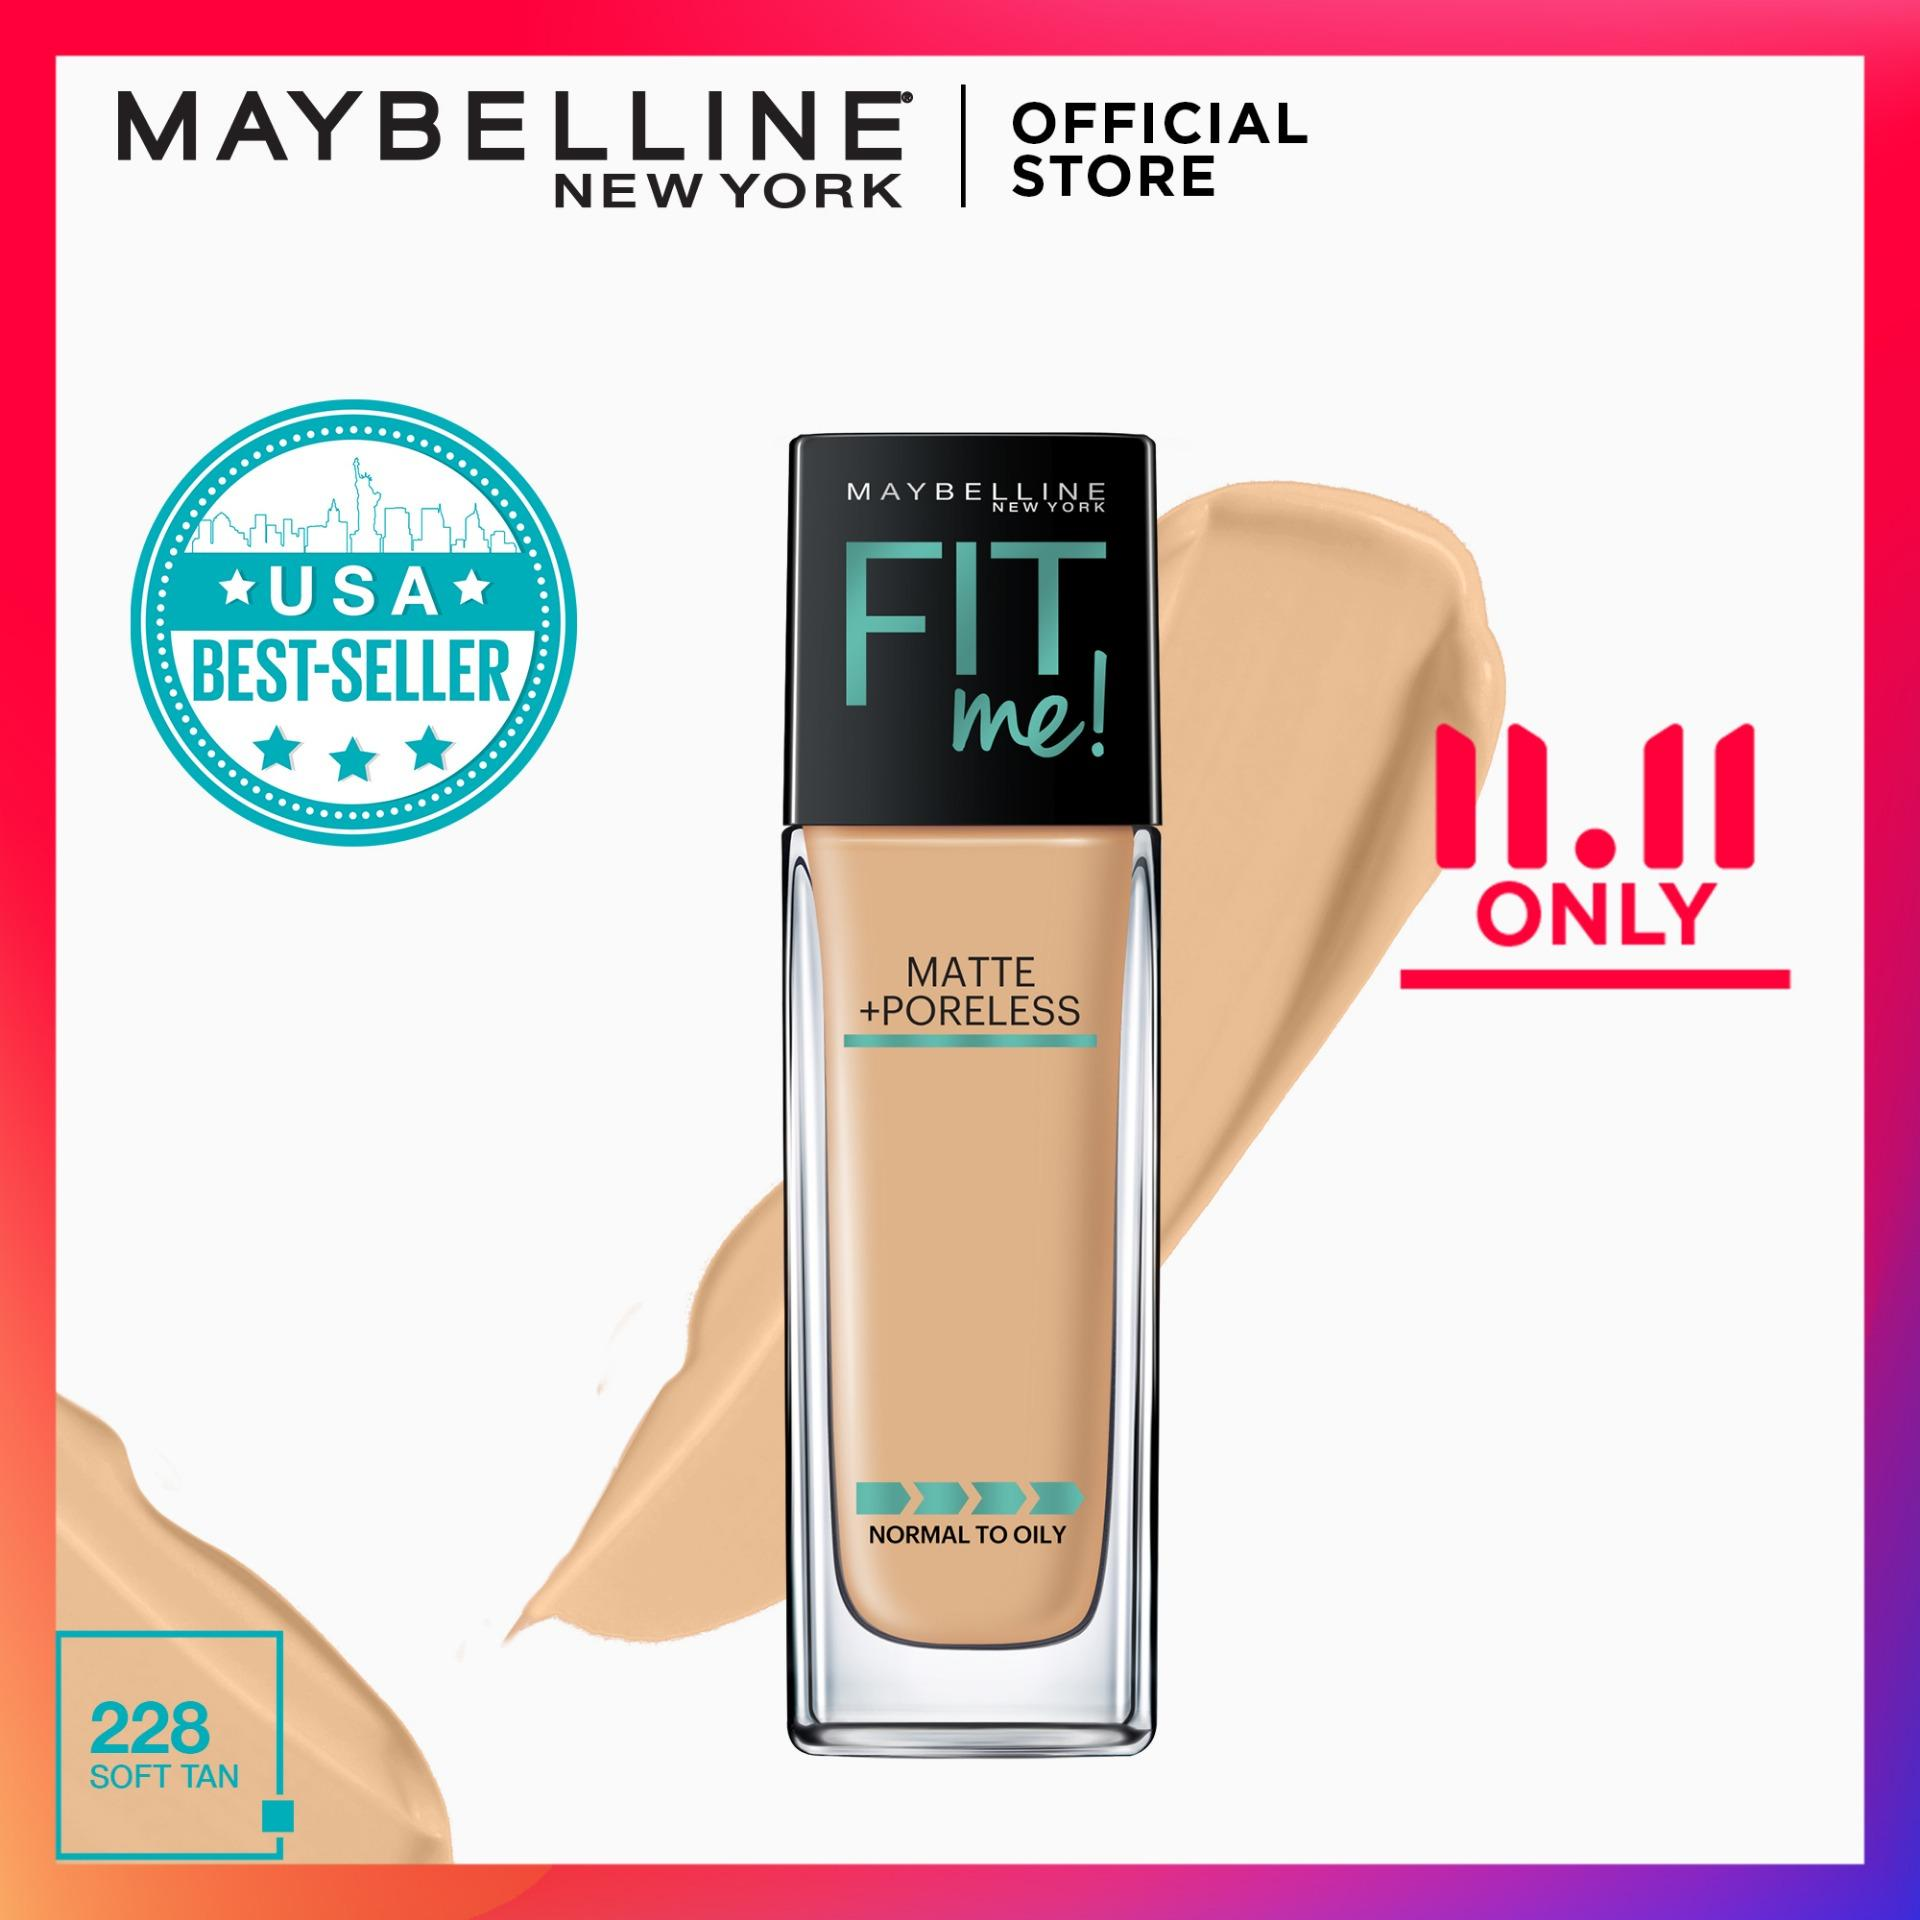 Maybelline Foundation Makeup Philippines Base Fit Me 30ml Matte Poreless Liquid 30 Ml 228 Soft Tan